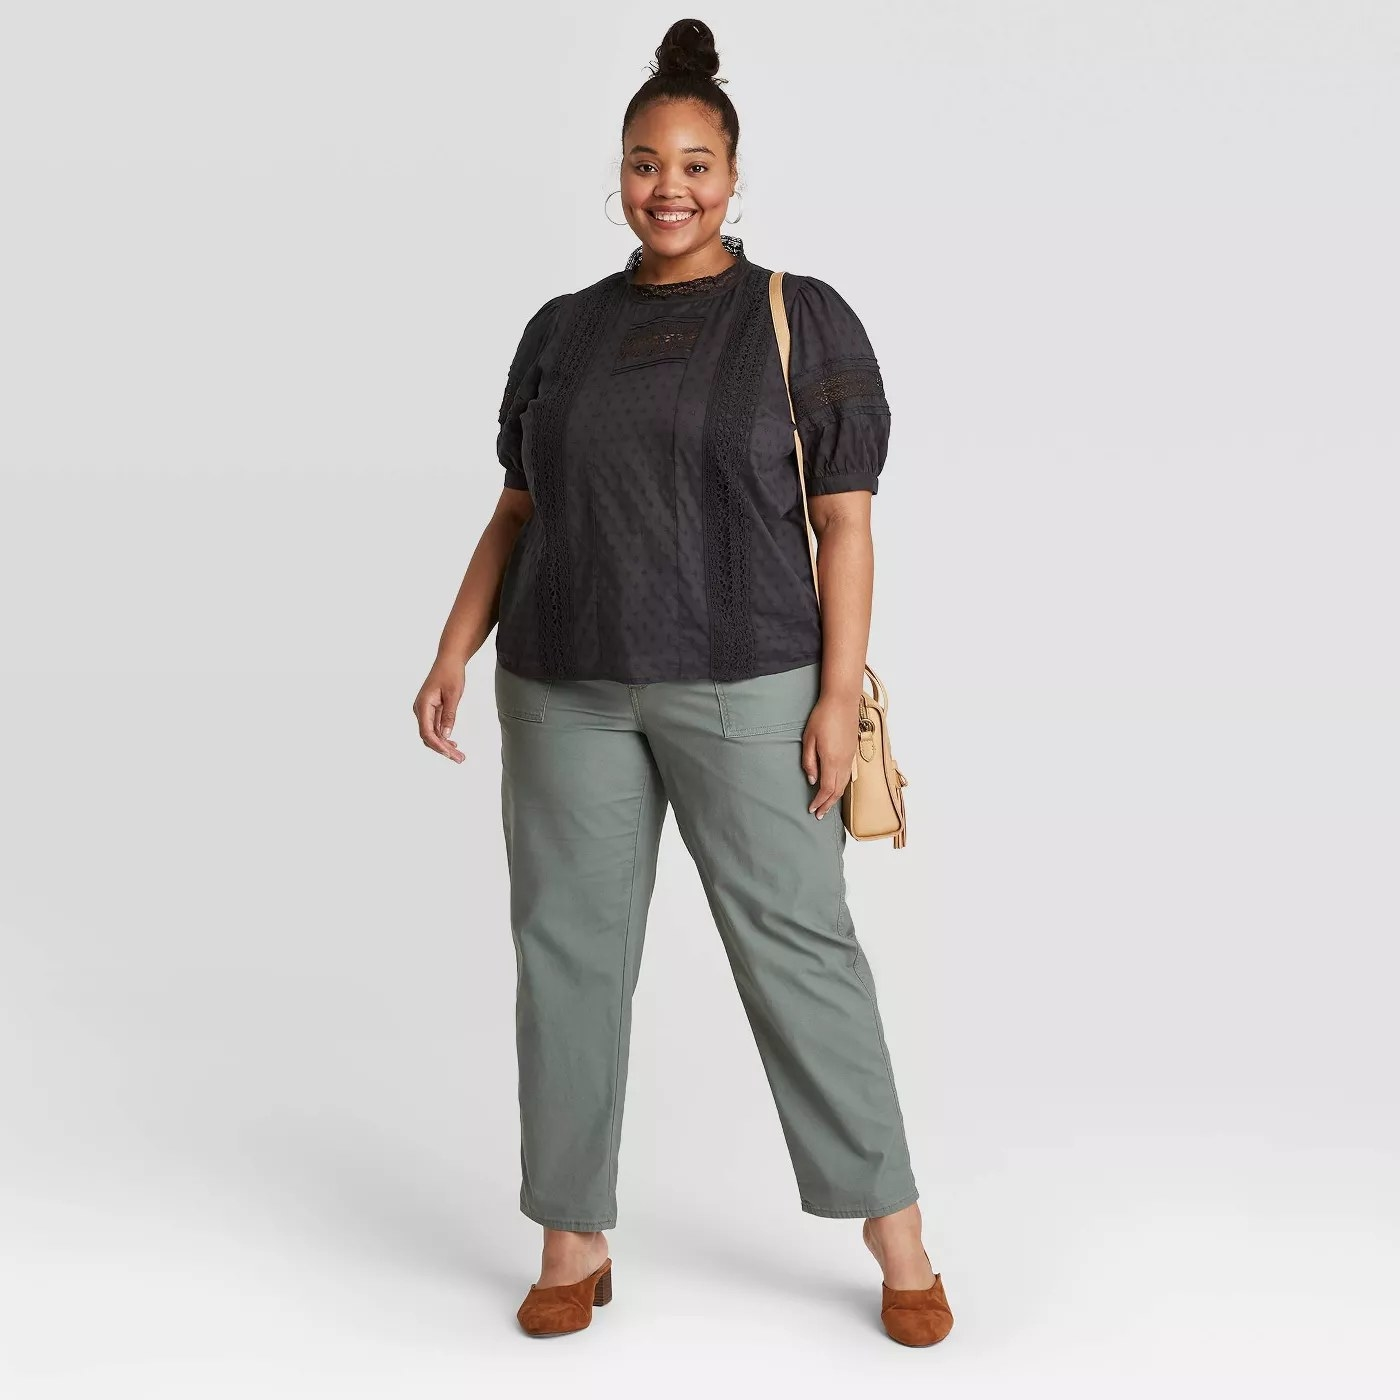 model wears black eyelet blouse with green khaki pants